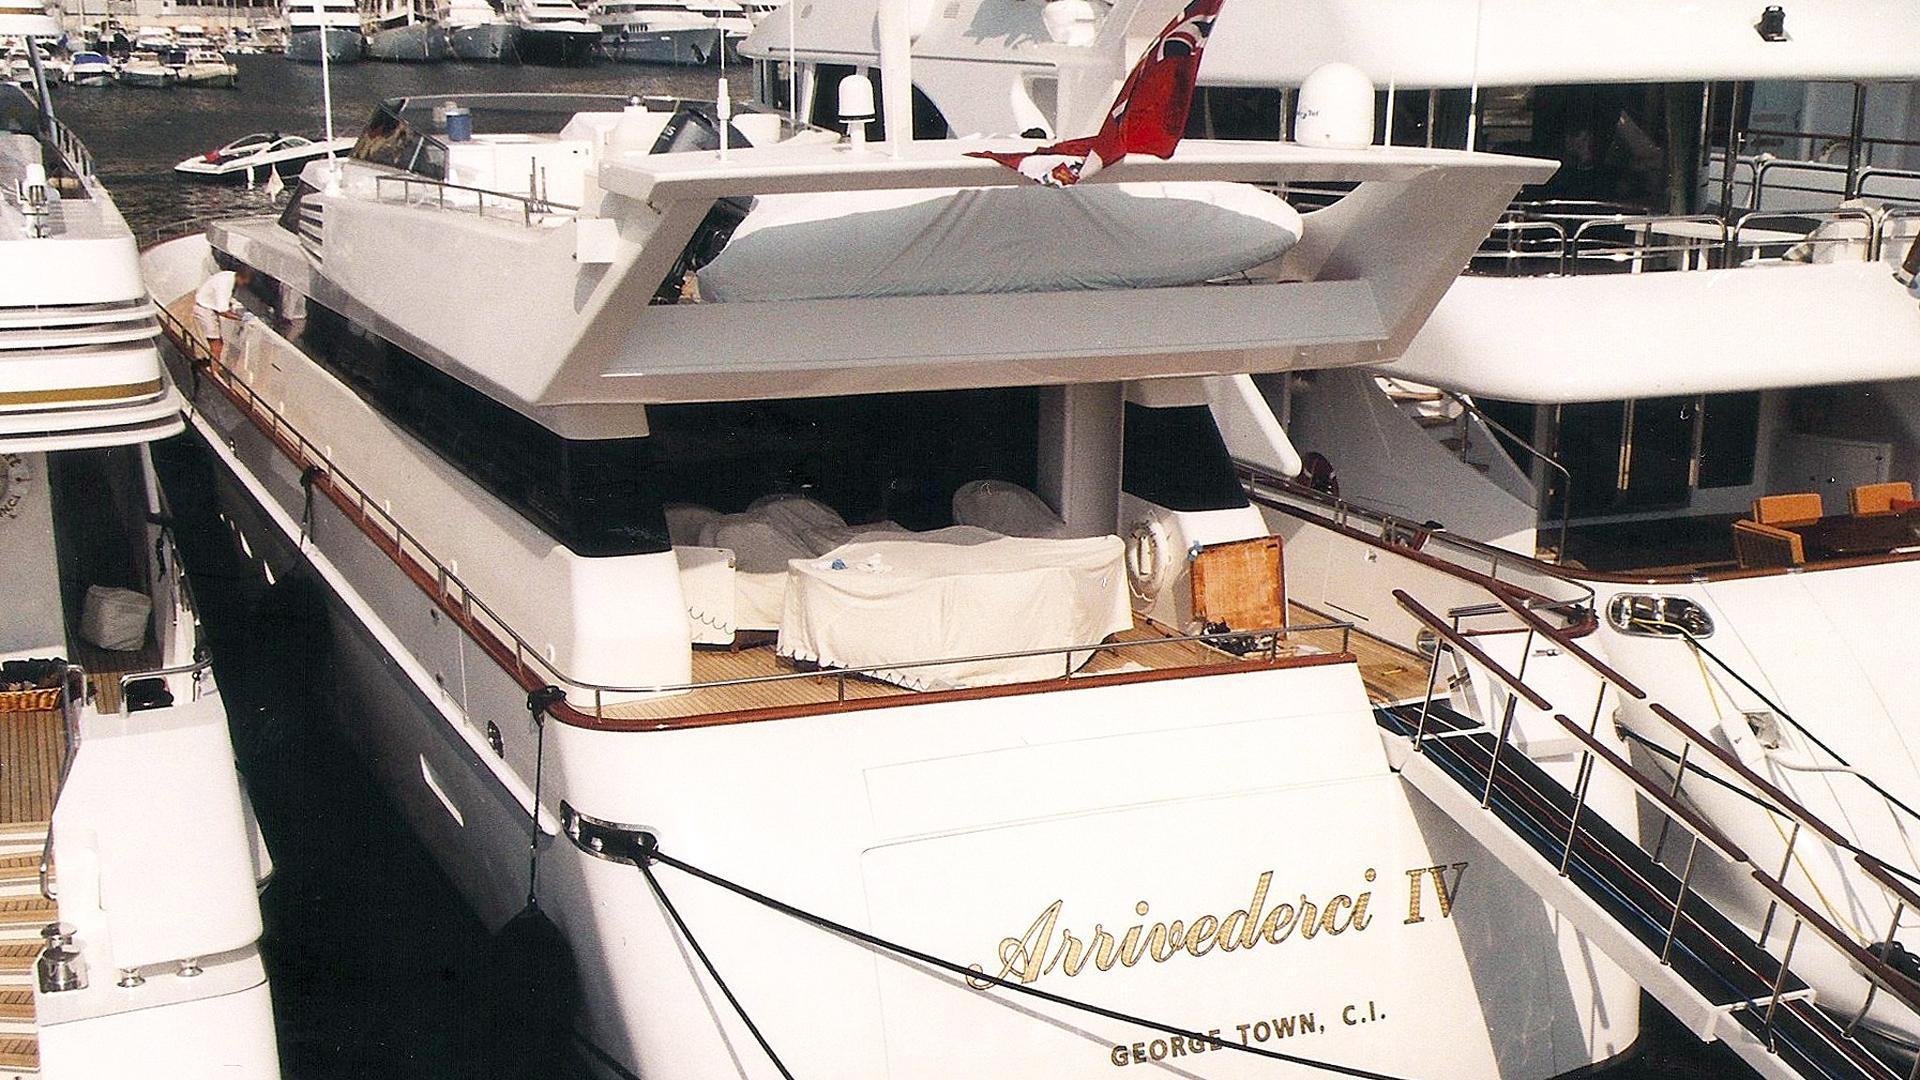 arrivederci-iv-motor-yacht-cantieri-di-pisa-akhir-34s-1998-34m-stern